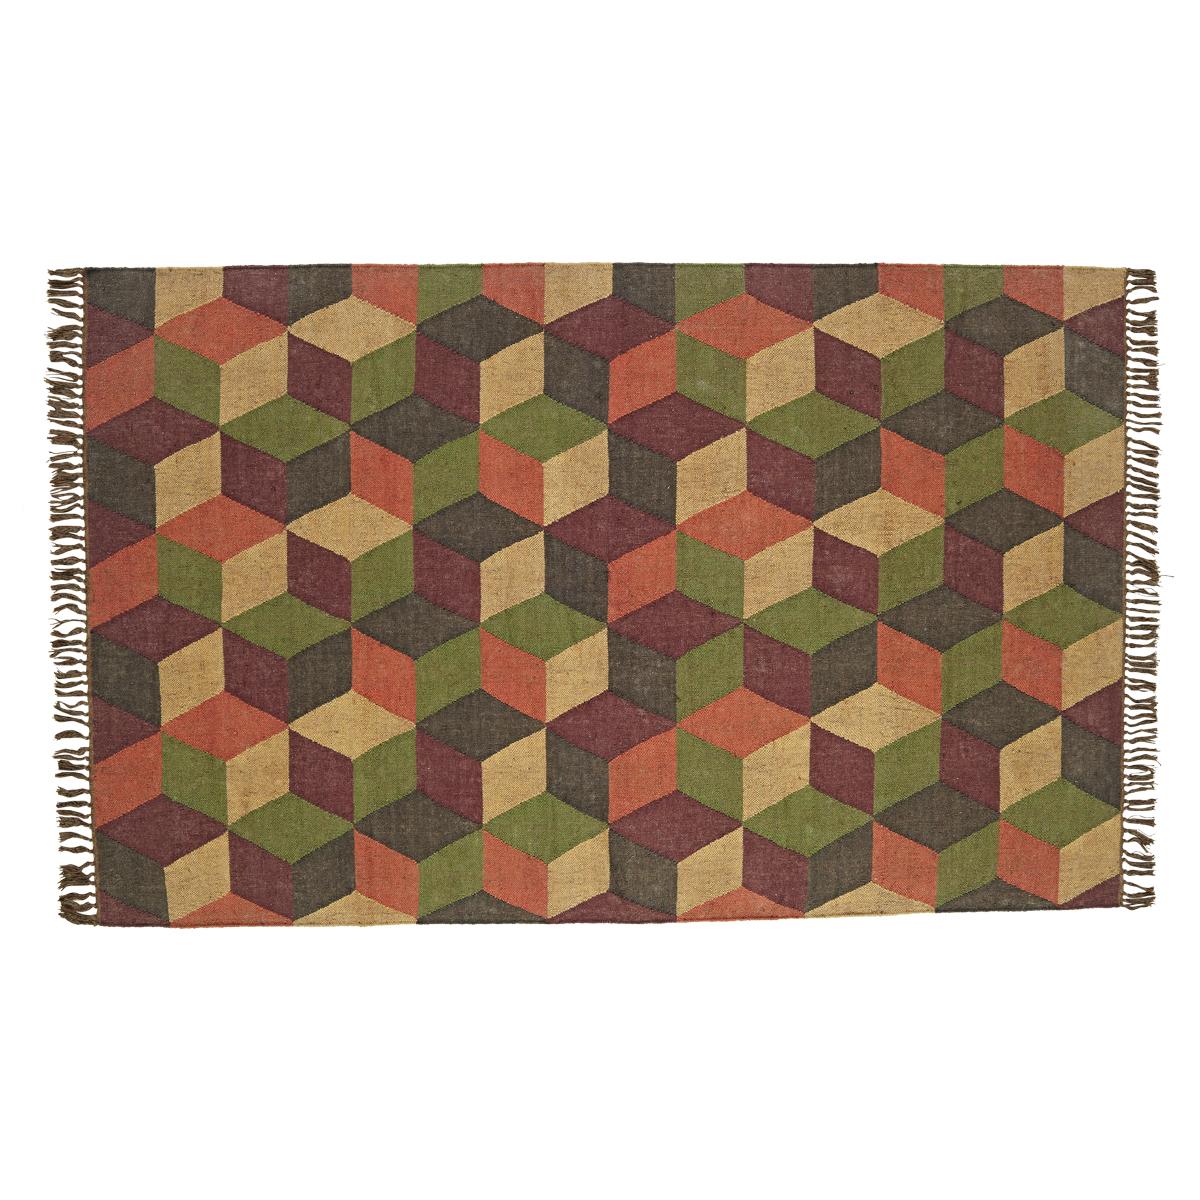 Calistoga Kilim Rug Rect 60x96